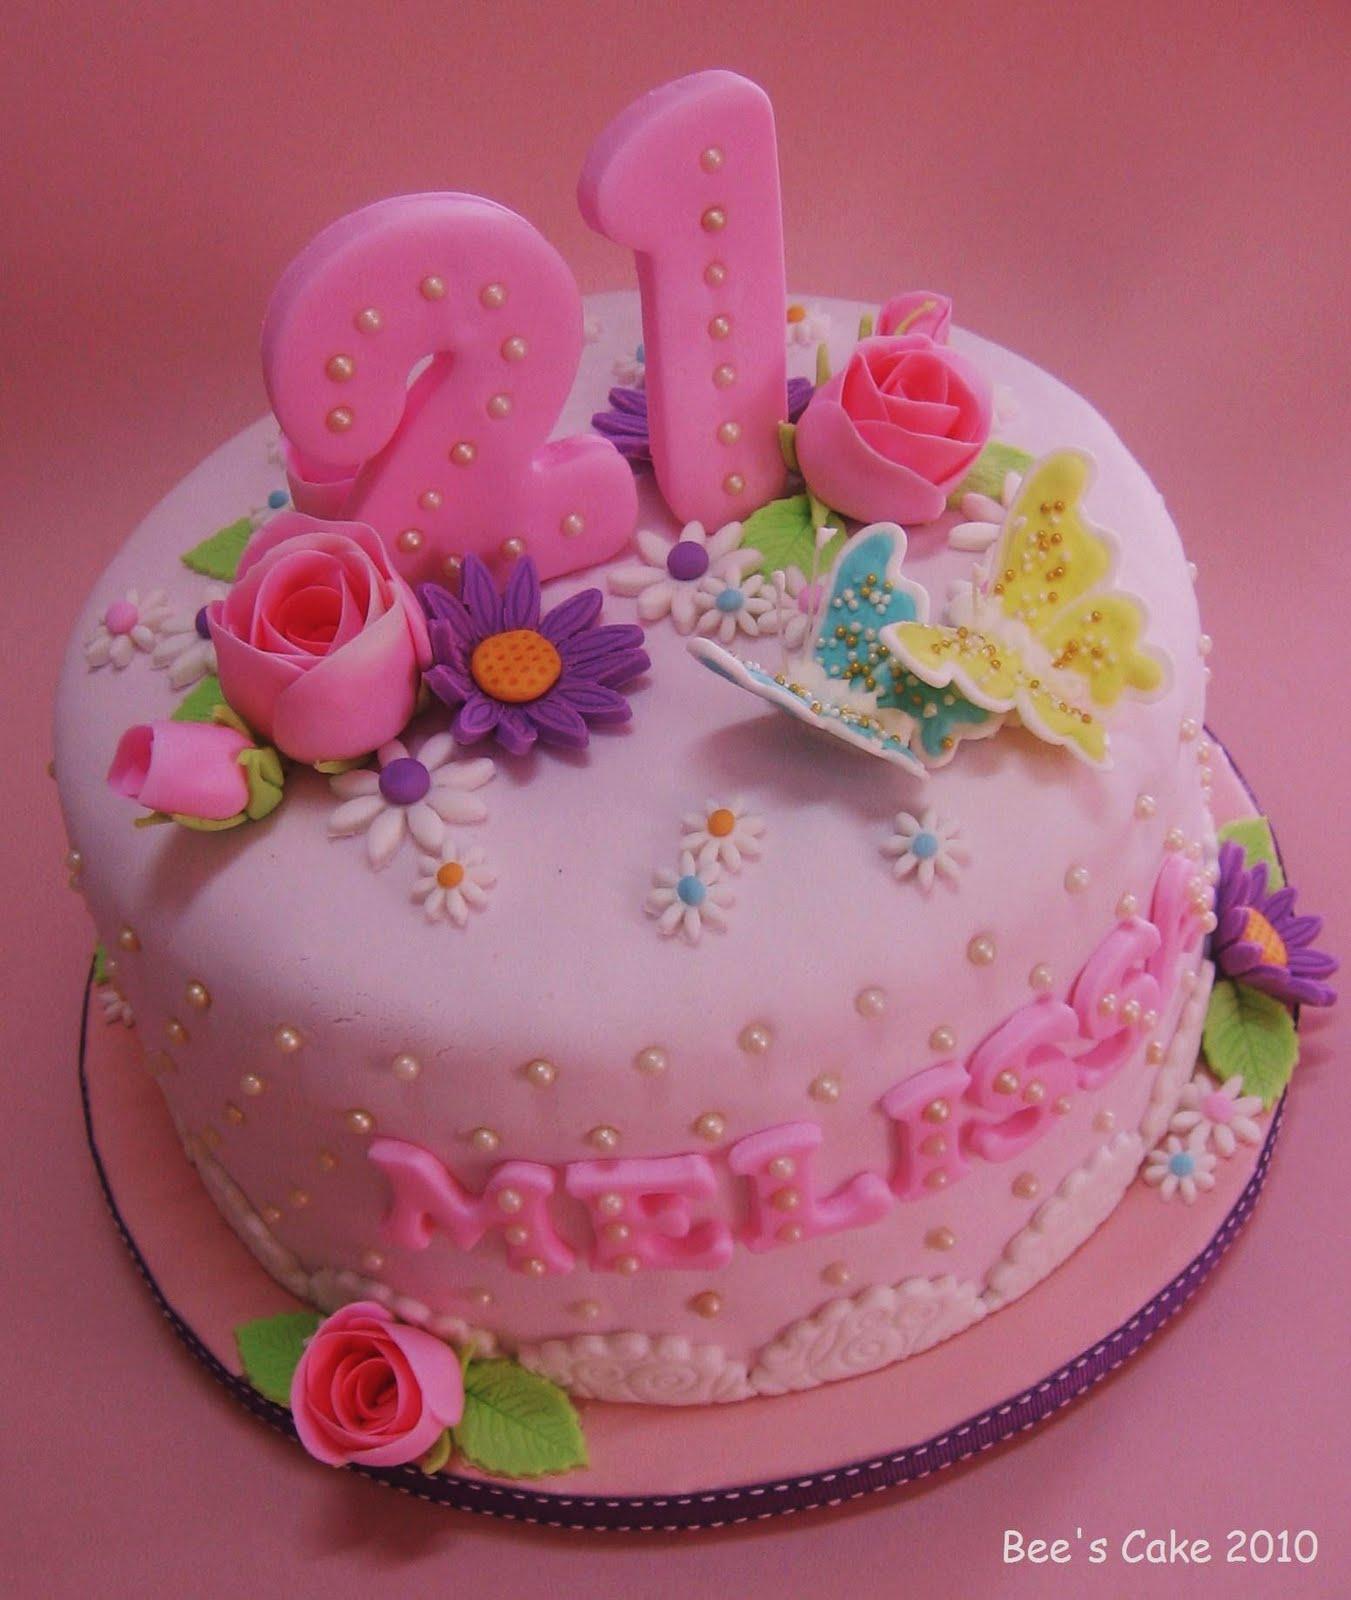 Bee's Cake: Melissa's 21st Birthday